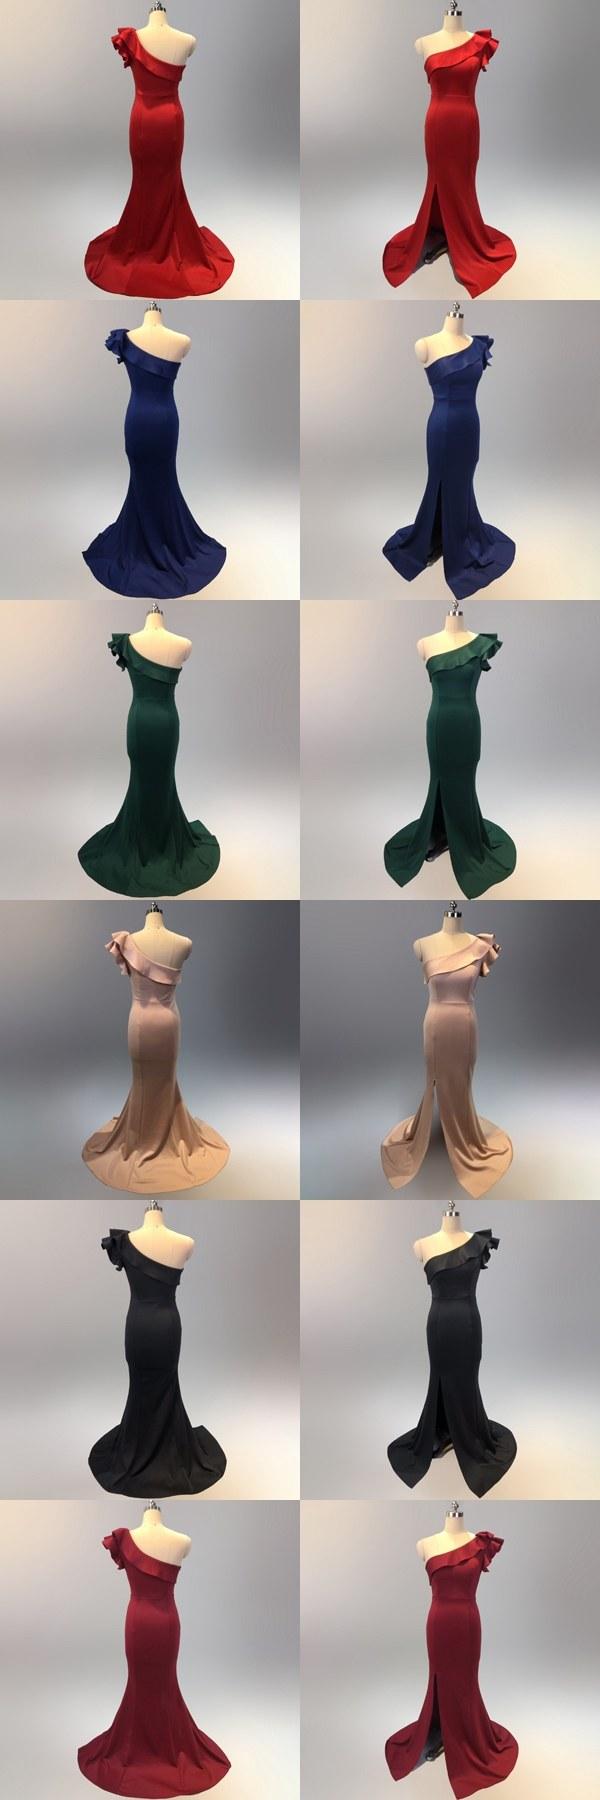 Ide Gaun Pengantin Muslimah Big Size Q0d4 7 Colors E Shoulder Long evening Dress